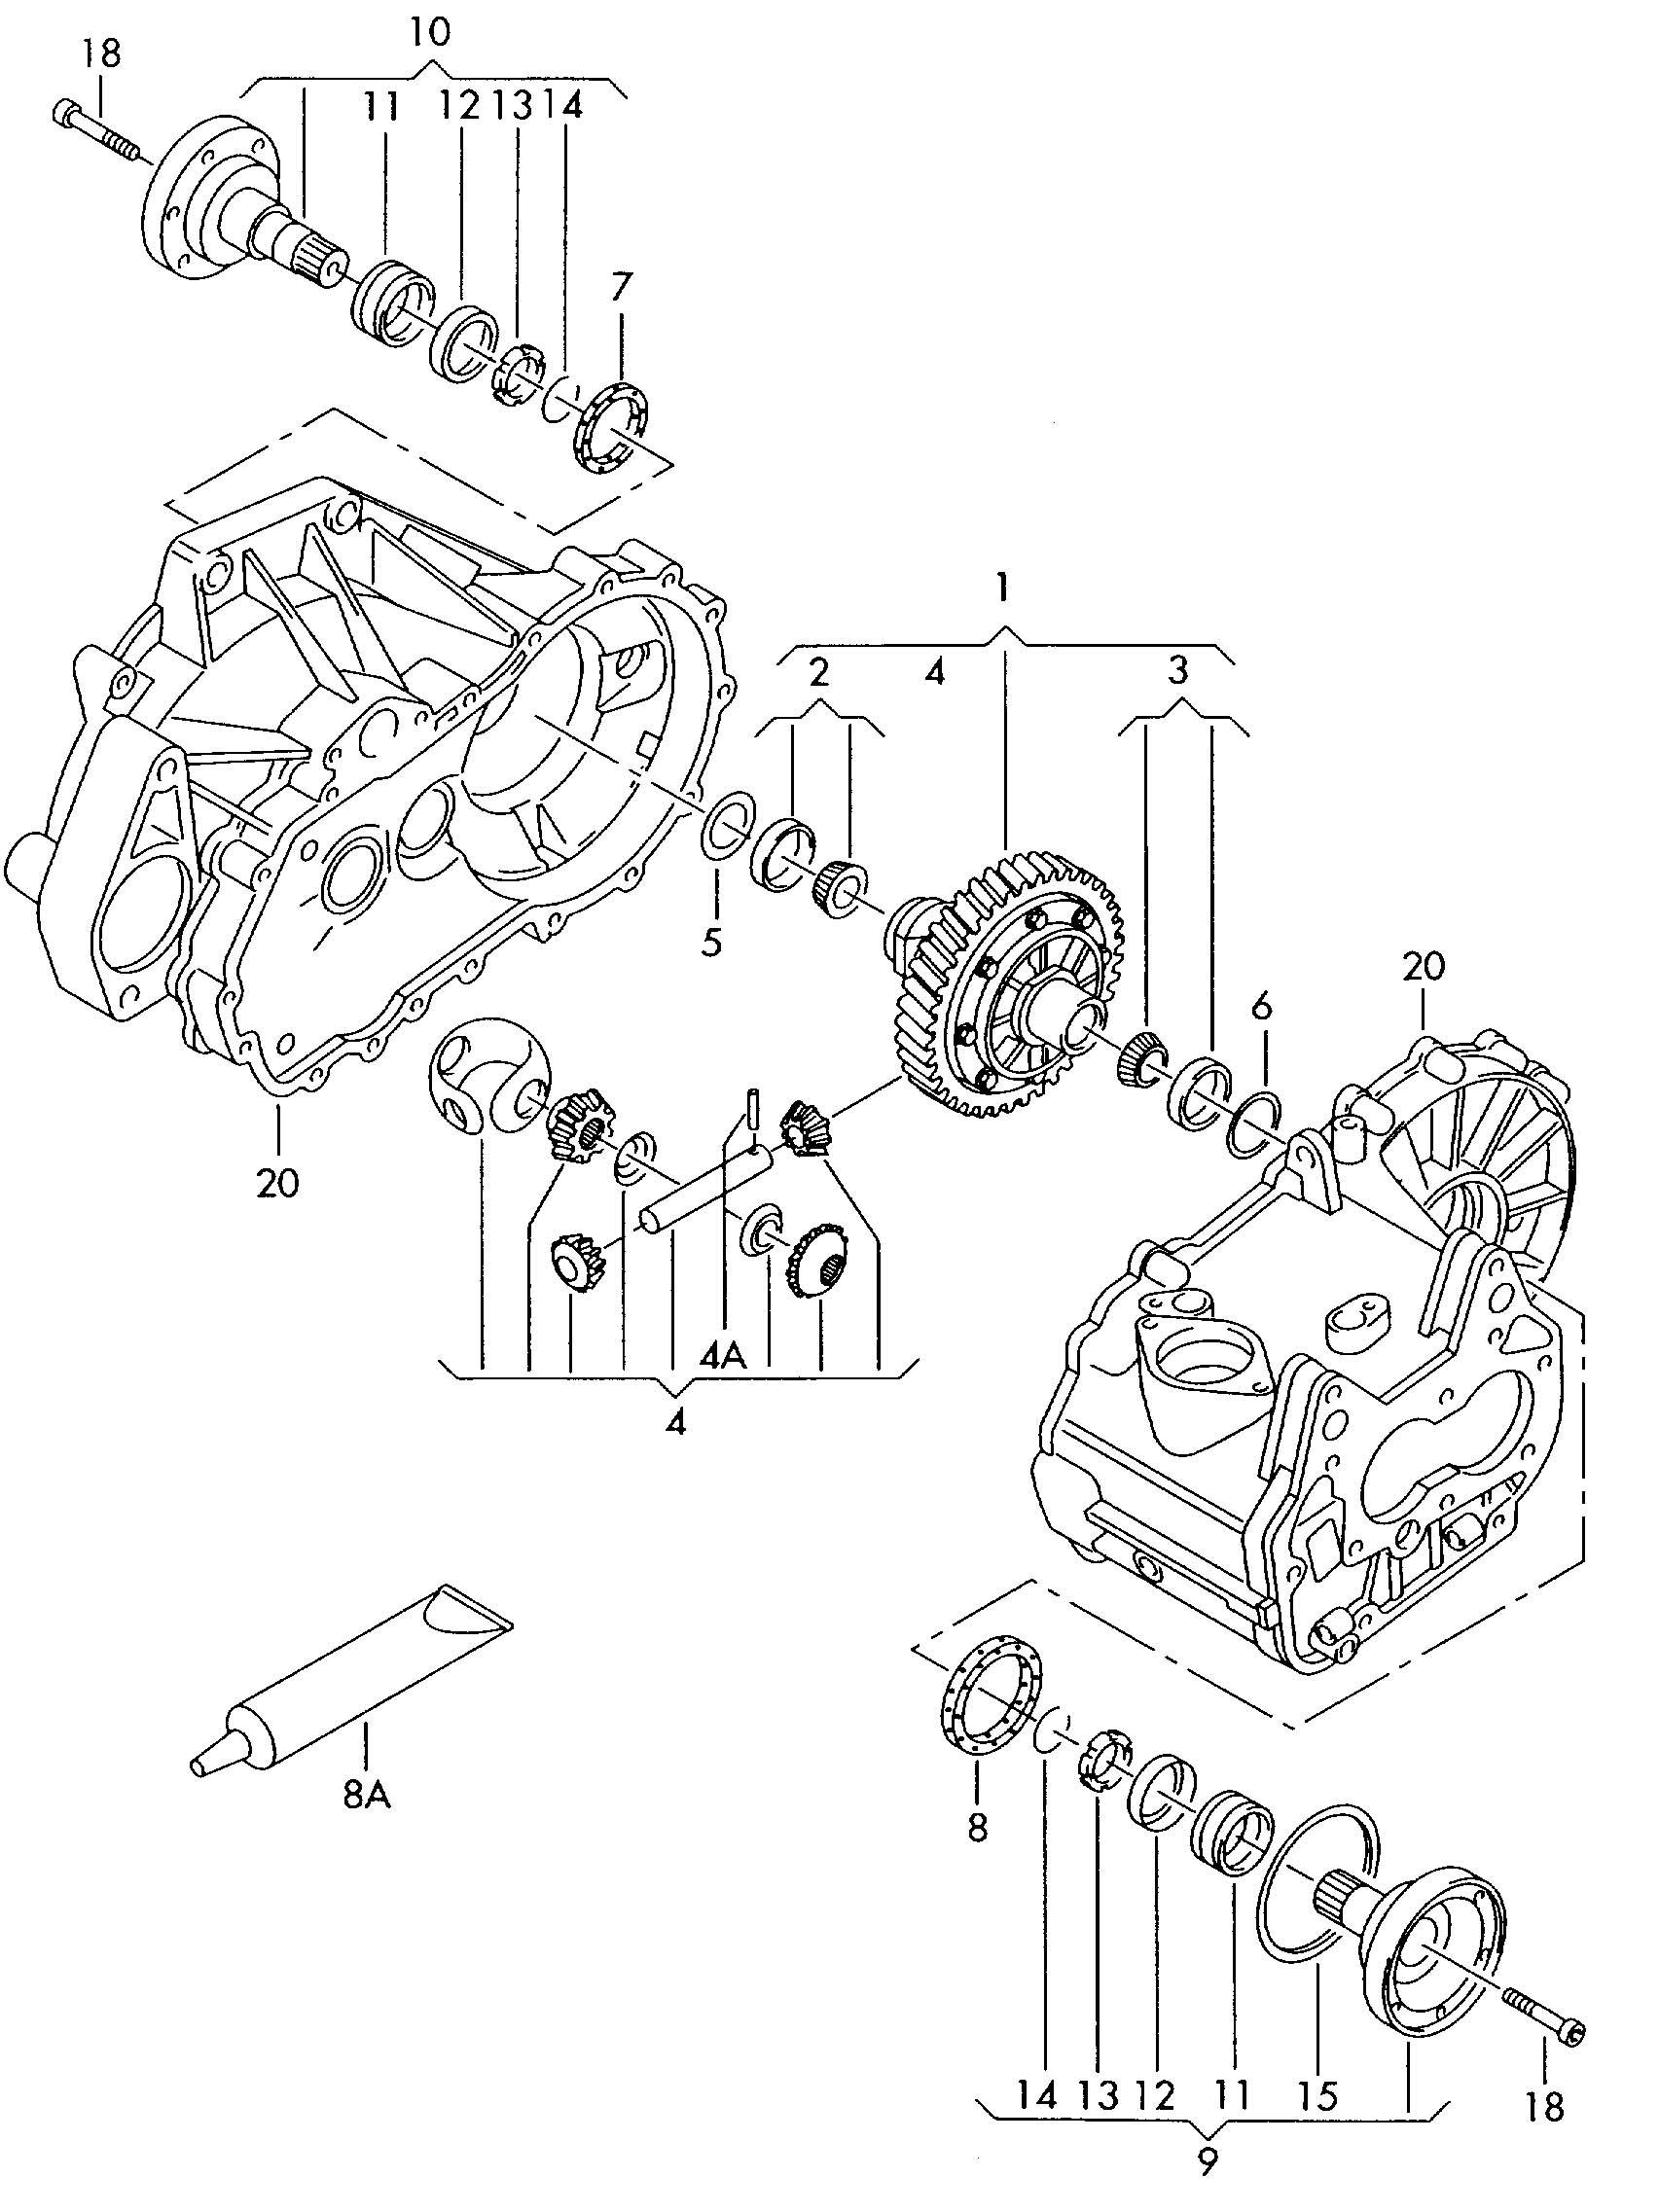 Volkswagen GTI Differential flange shaft for 5 speed